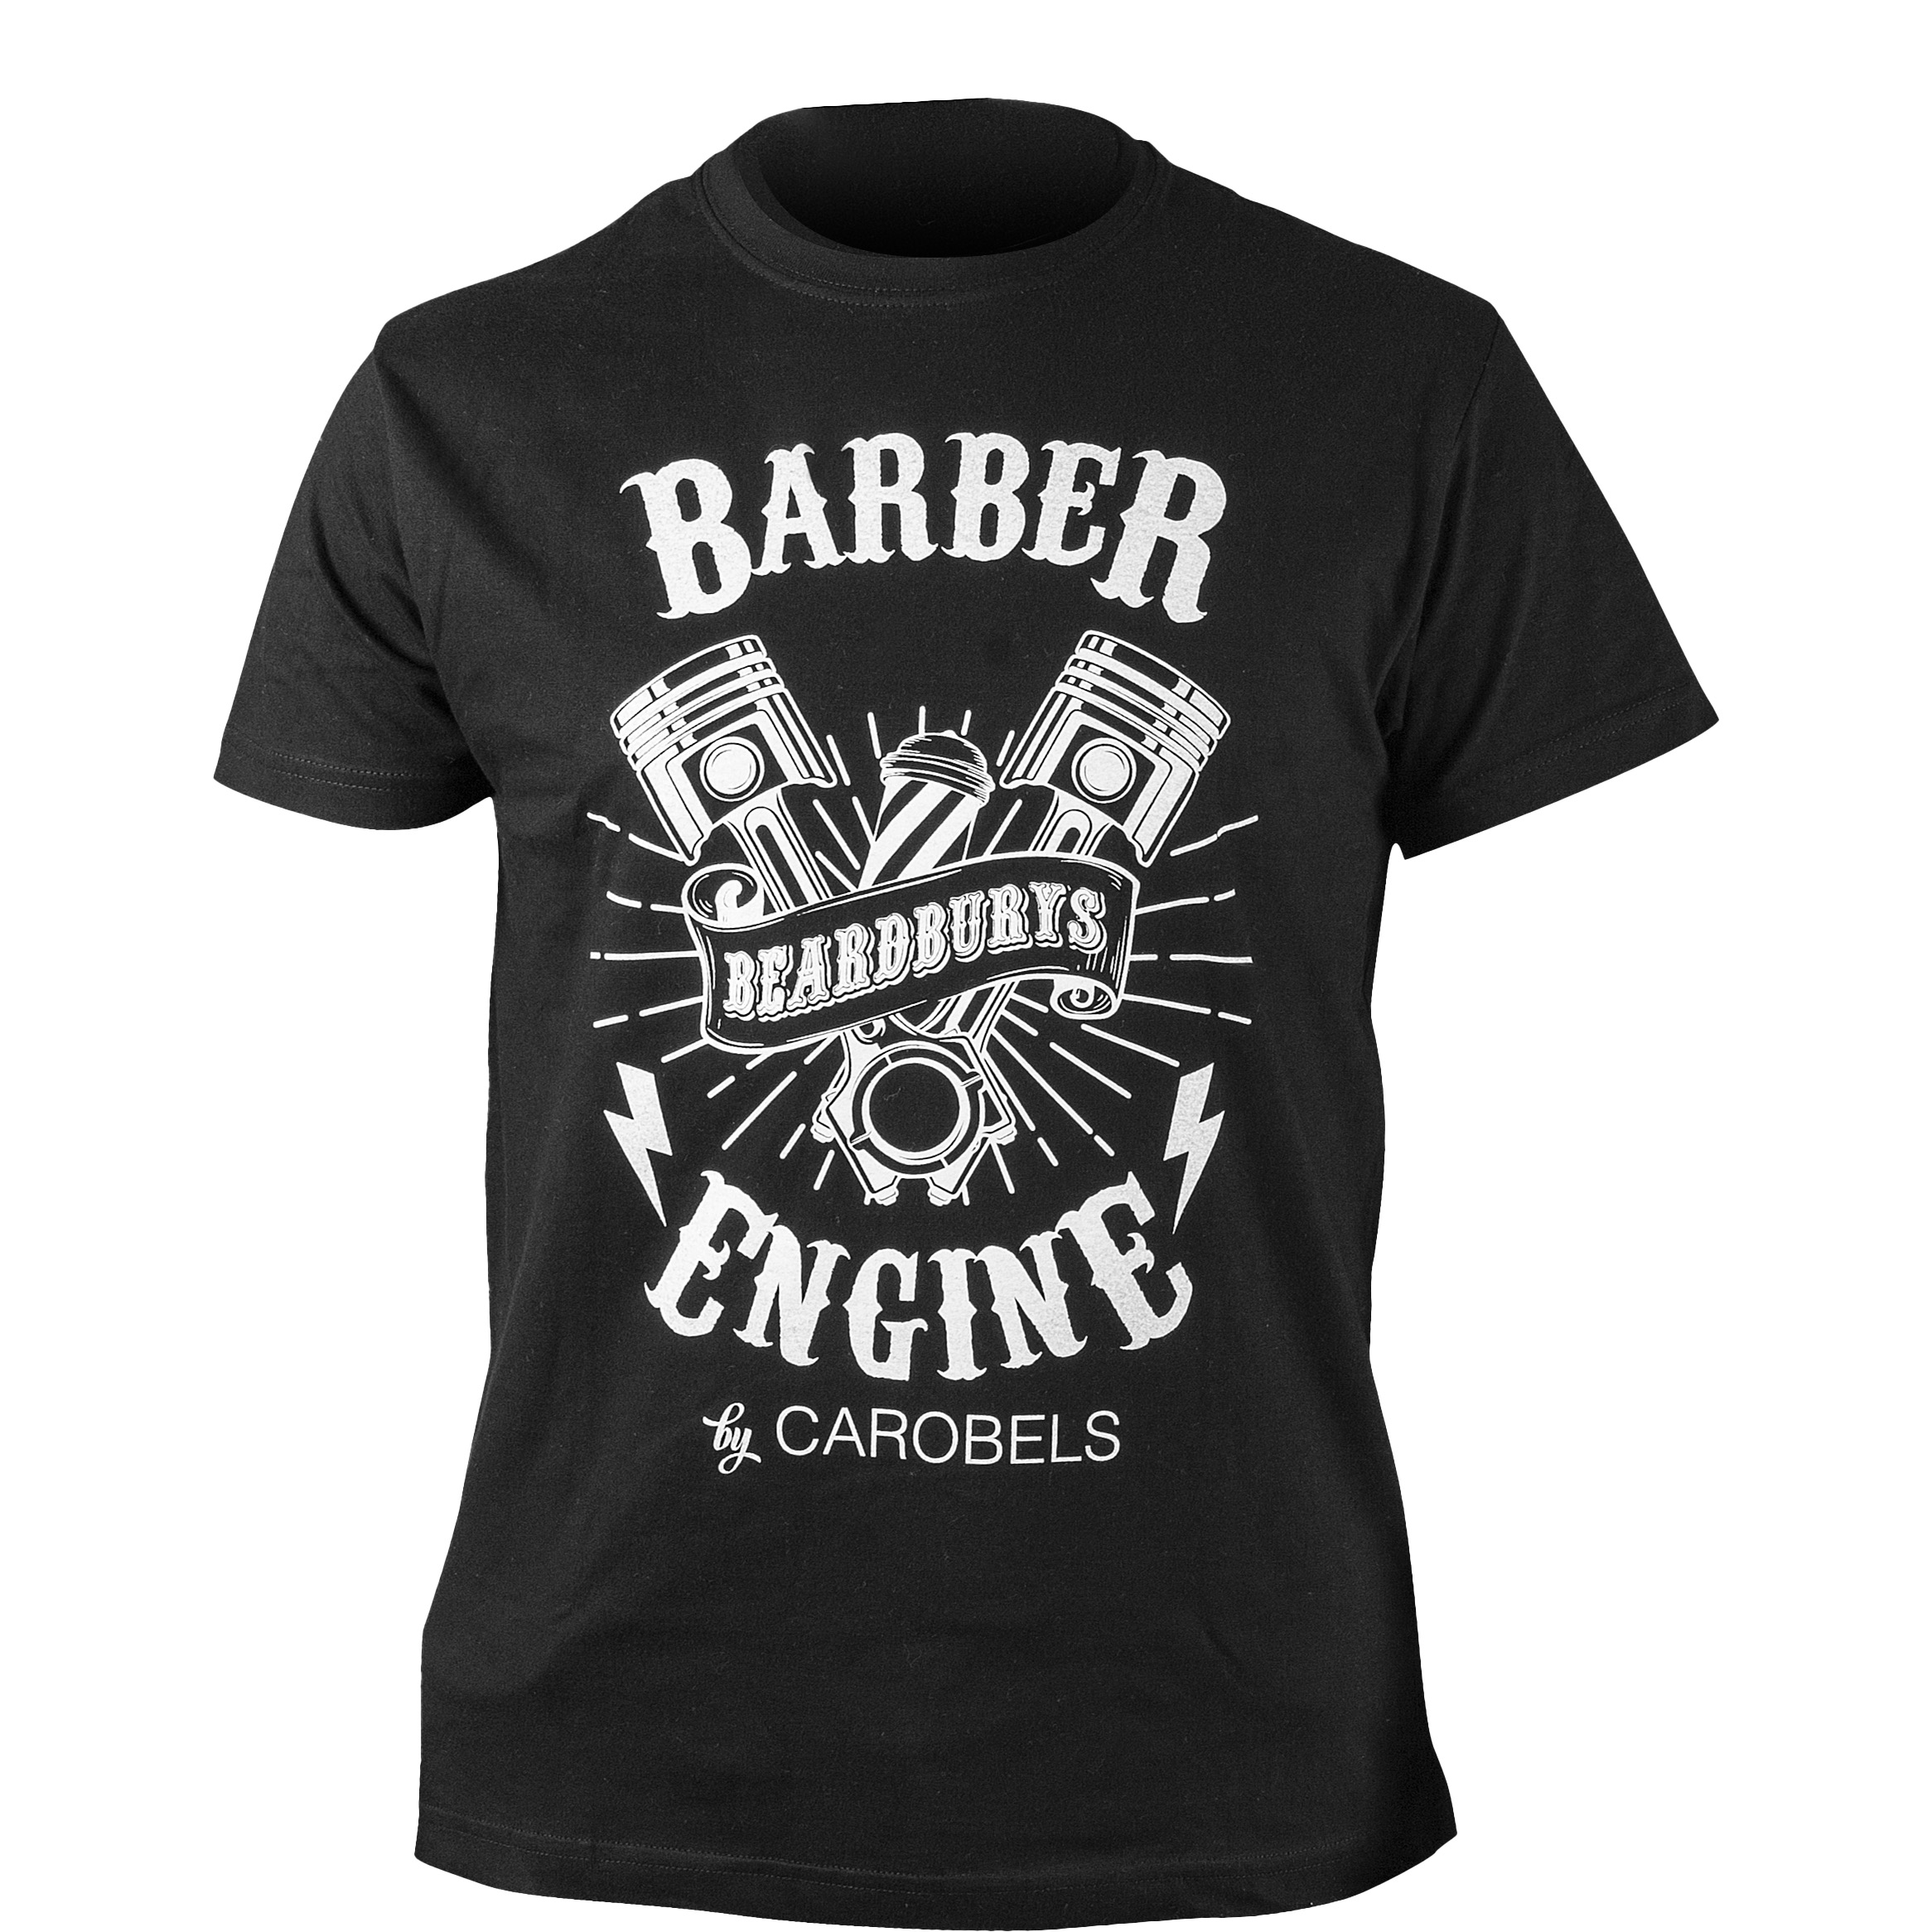 Barber Engine T-shirt maat L